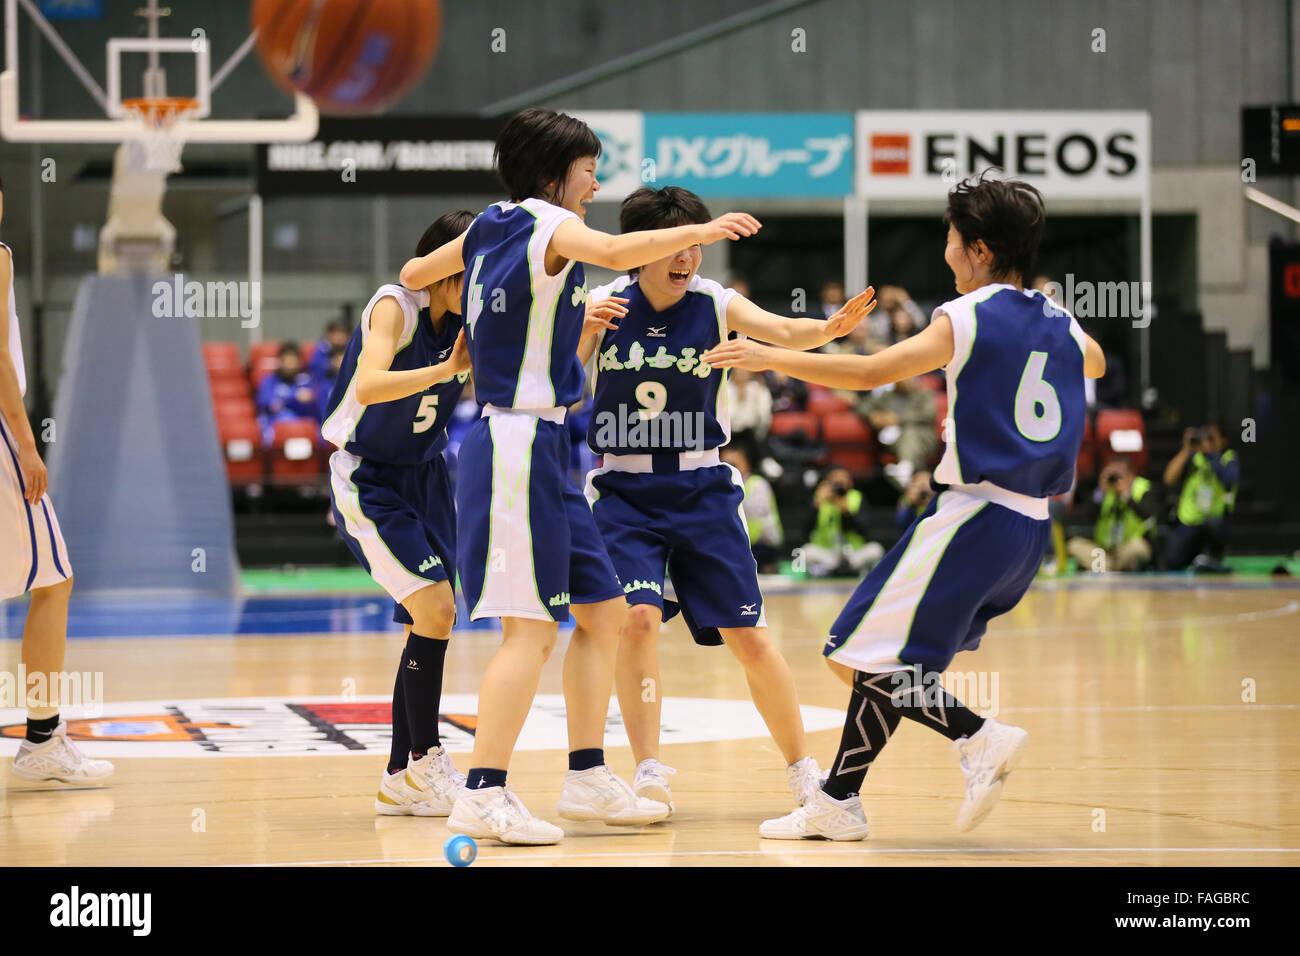 Tokyo Metropolitan Gymnasium, Tokyo, Japan. 28th Dec, 2015. Gifu joshi team group, DECEMBER 28, 2015 - Basketball Stock Photo